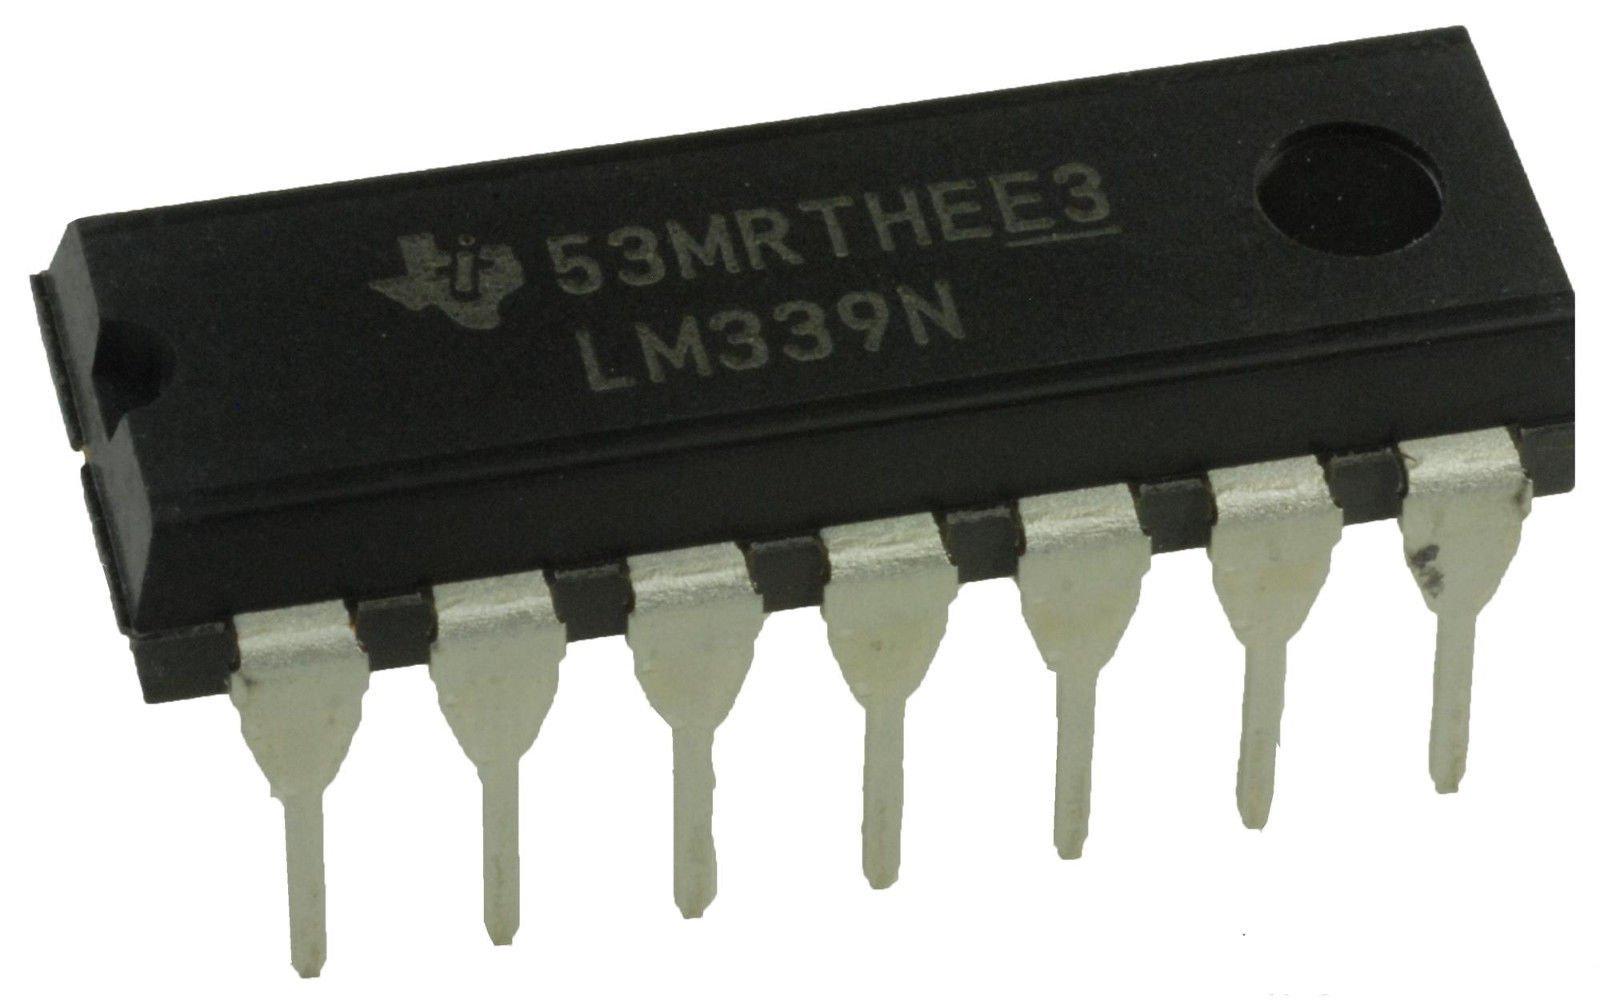 LM339 LM339N Quad Differential Comparators DIP14 20 Pack